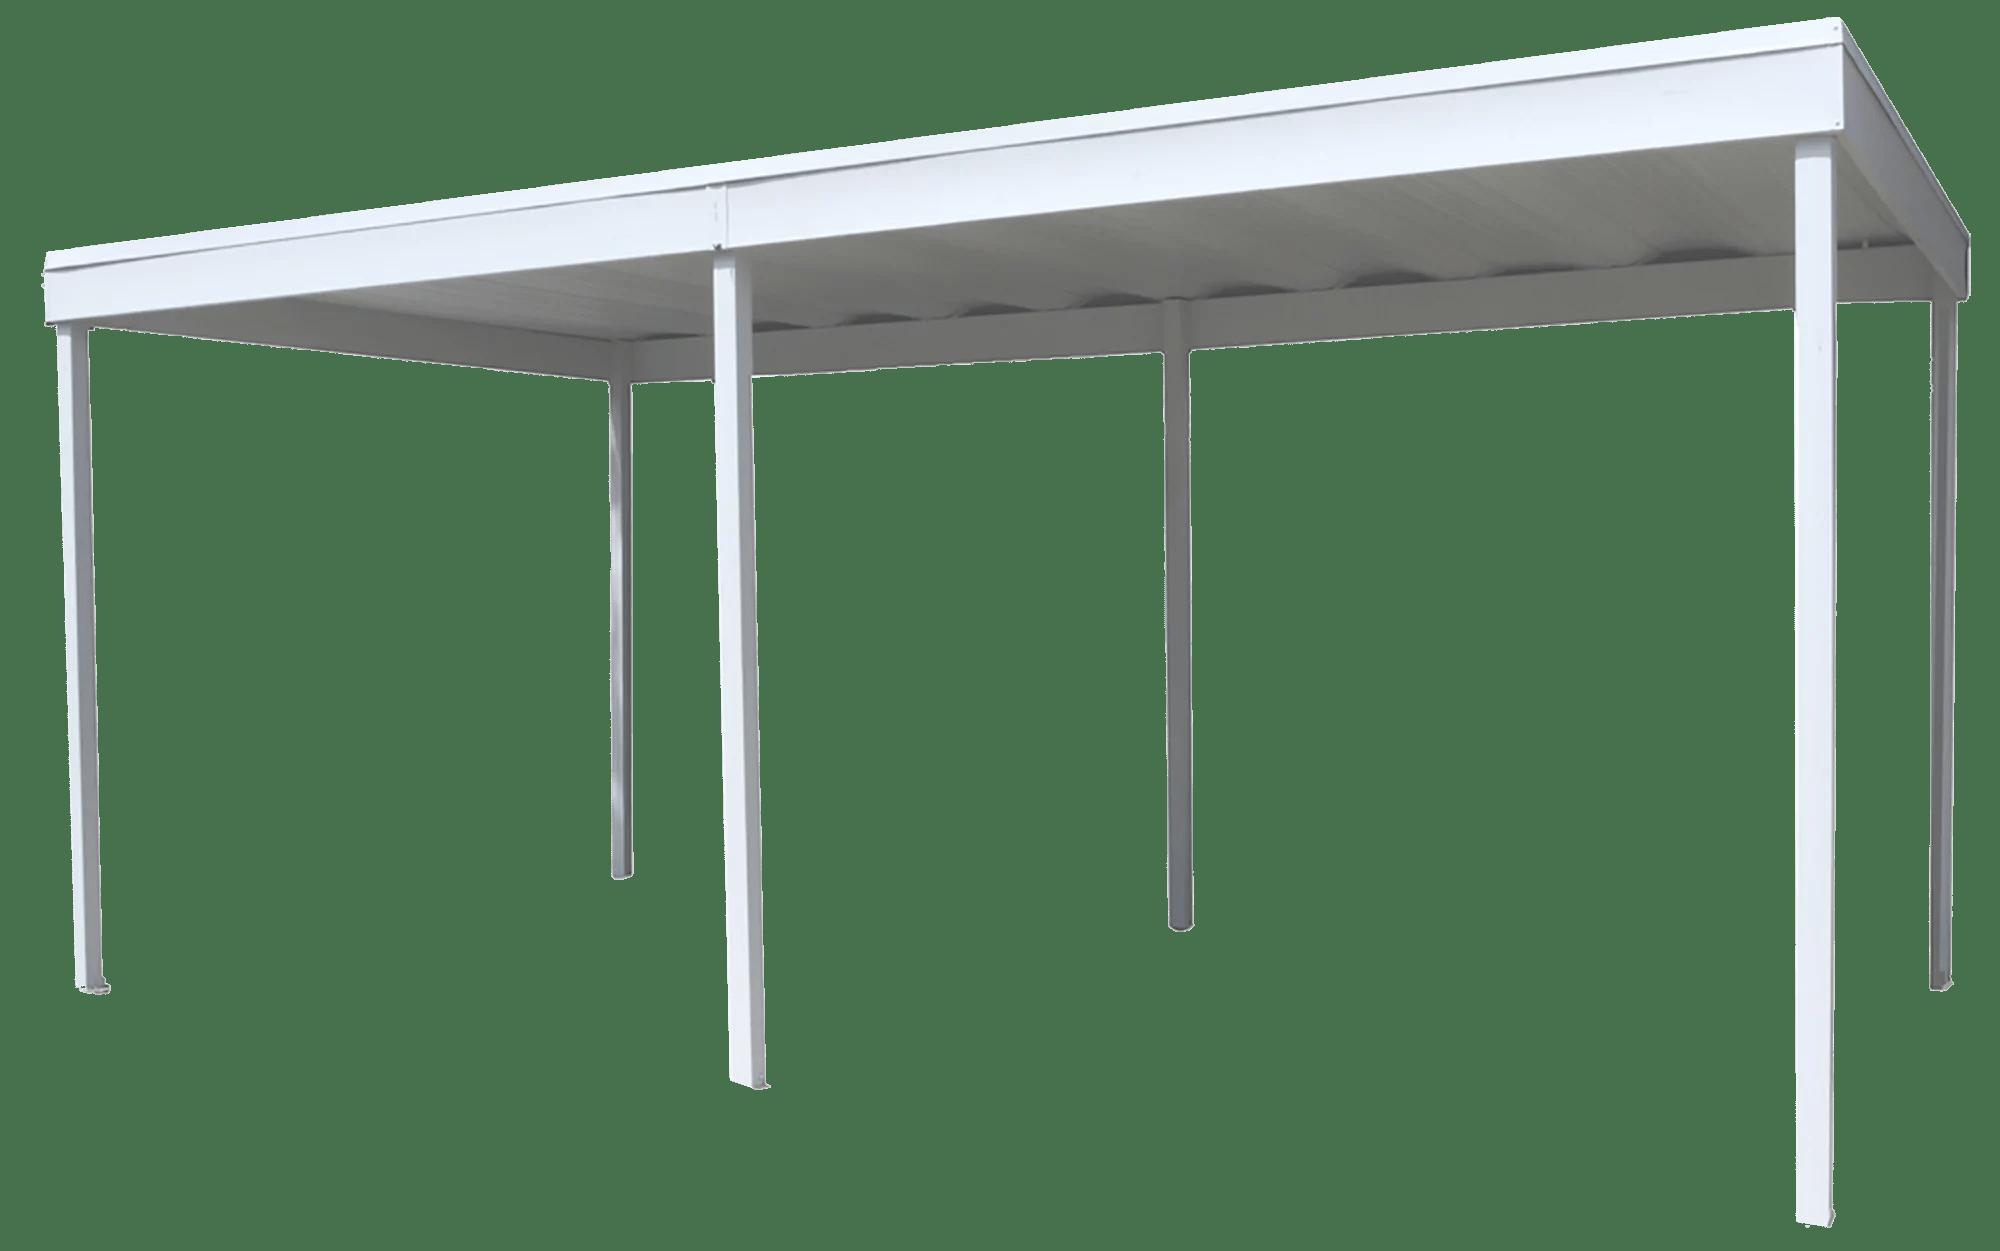 arrow freestanding steel carport patio cover 10x20 eggshell